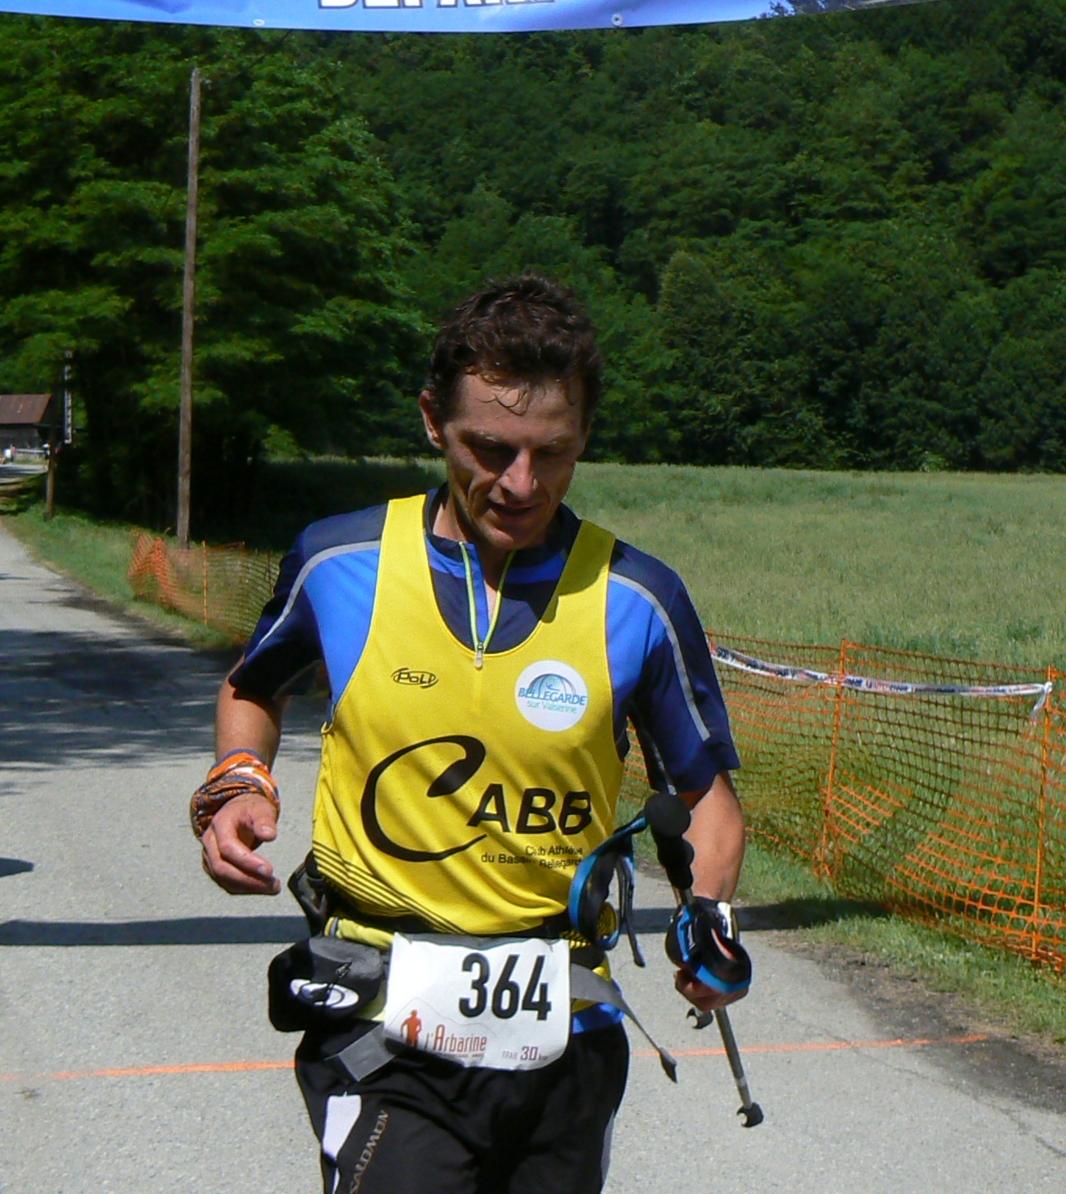 Joris Milleret 1  - RESULTATS, COMPTE RENDU ET PHOTOS DE L'ARBARINE / 07-06-15